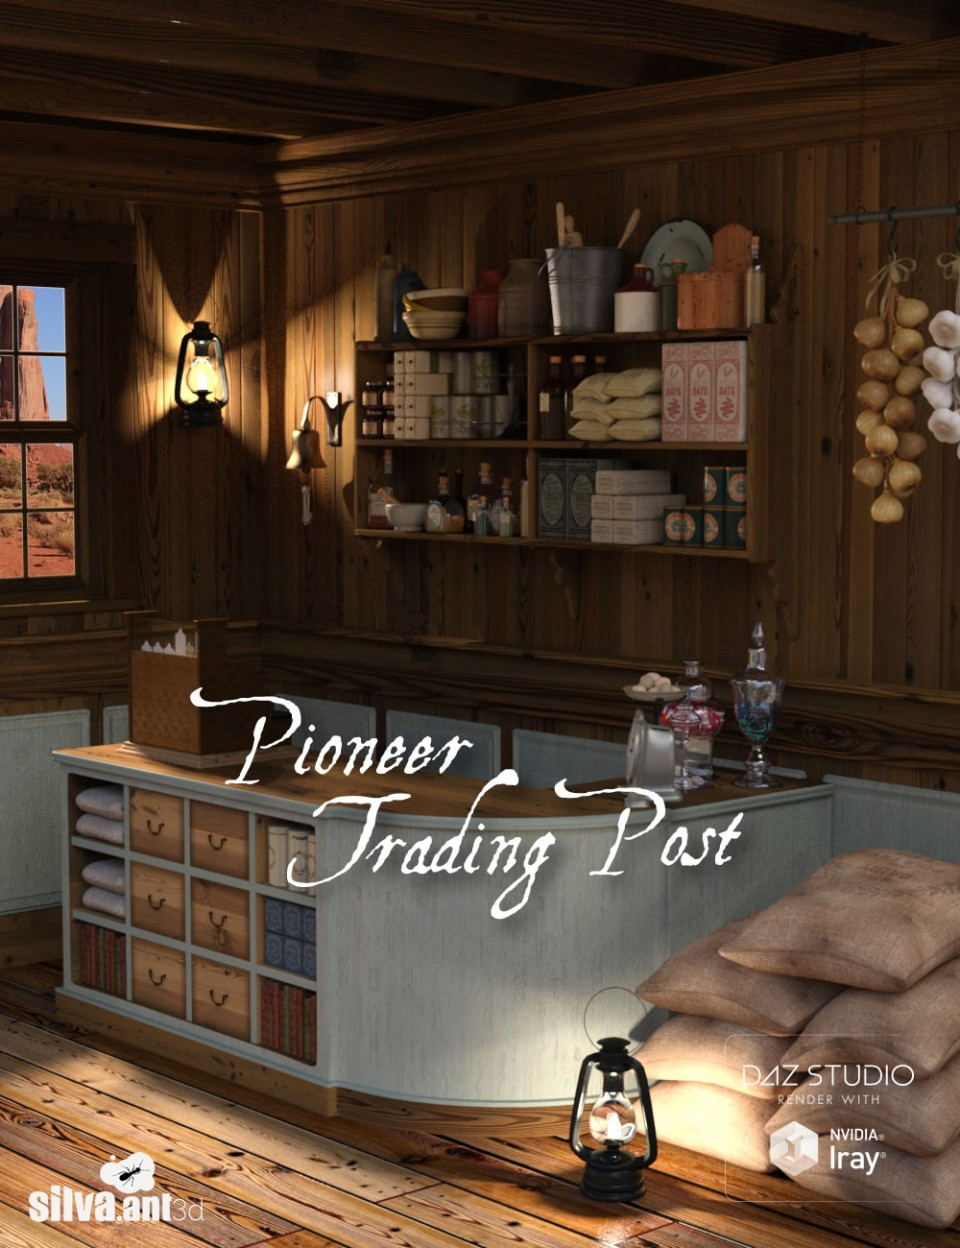 Pioneer Trading Post